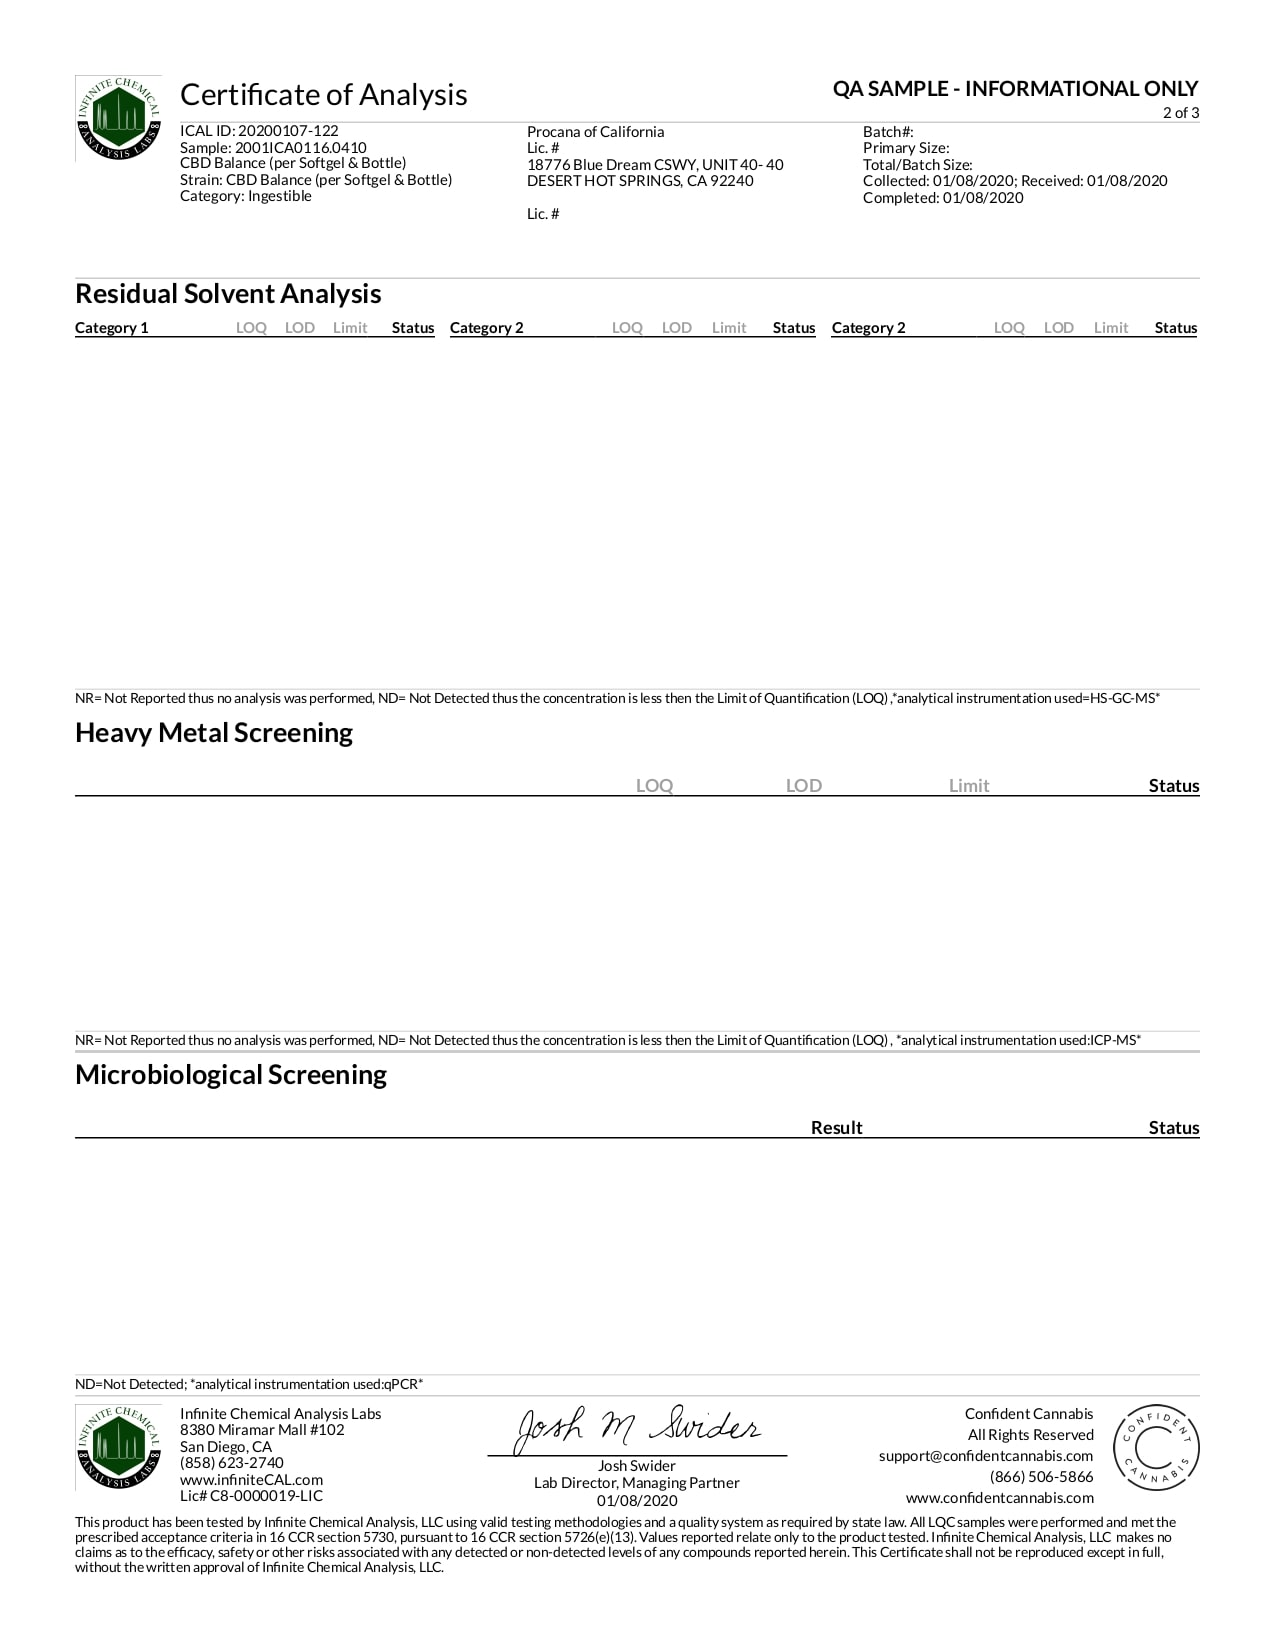 Procana CBD Balance Softgels 240mg Lab Report